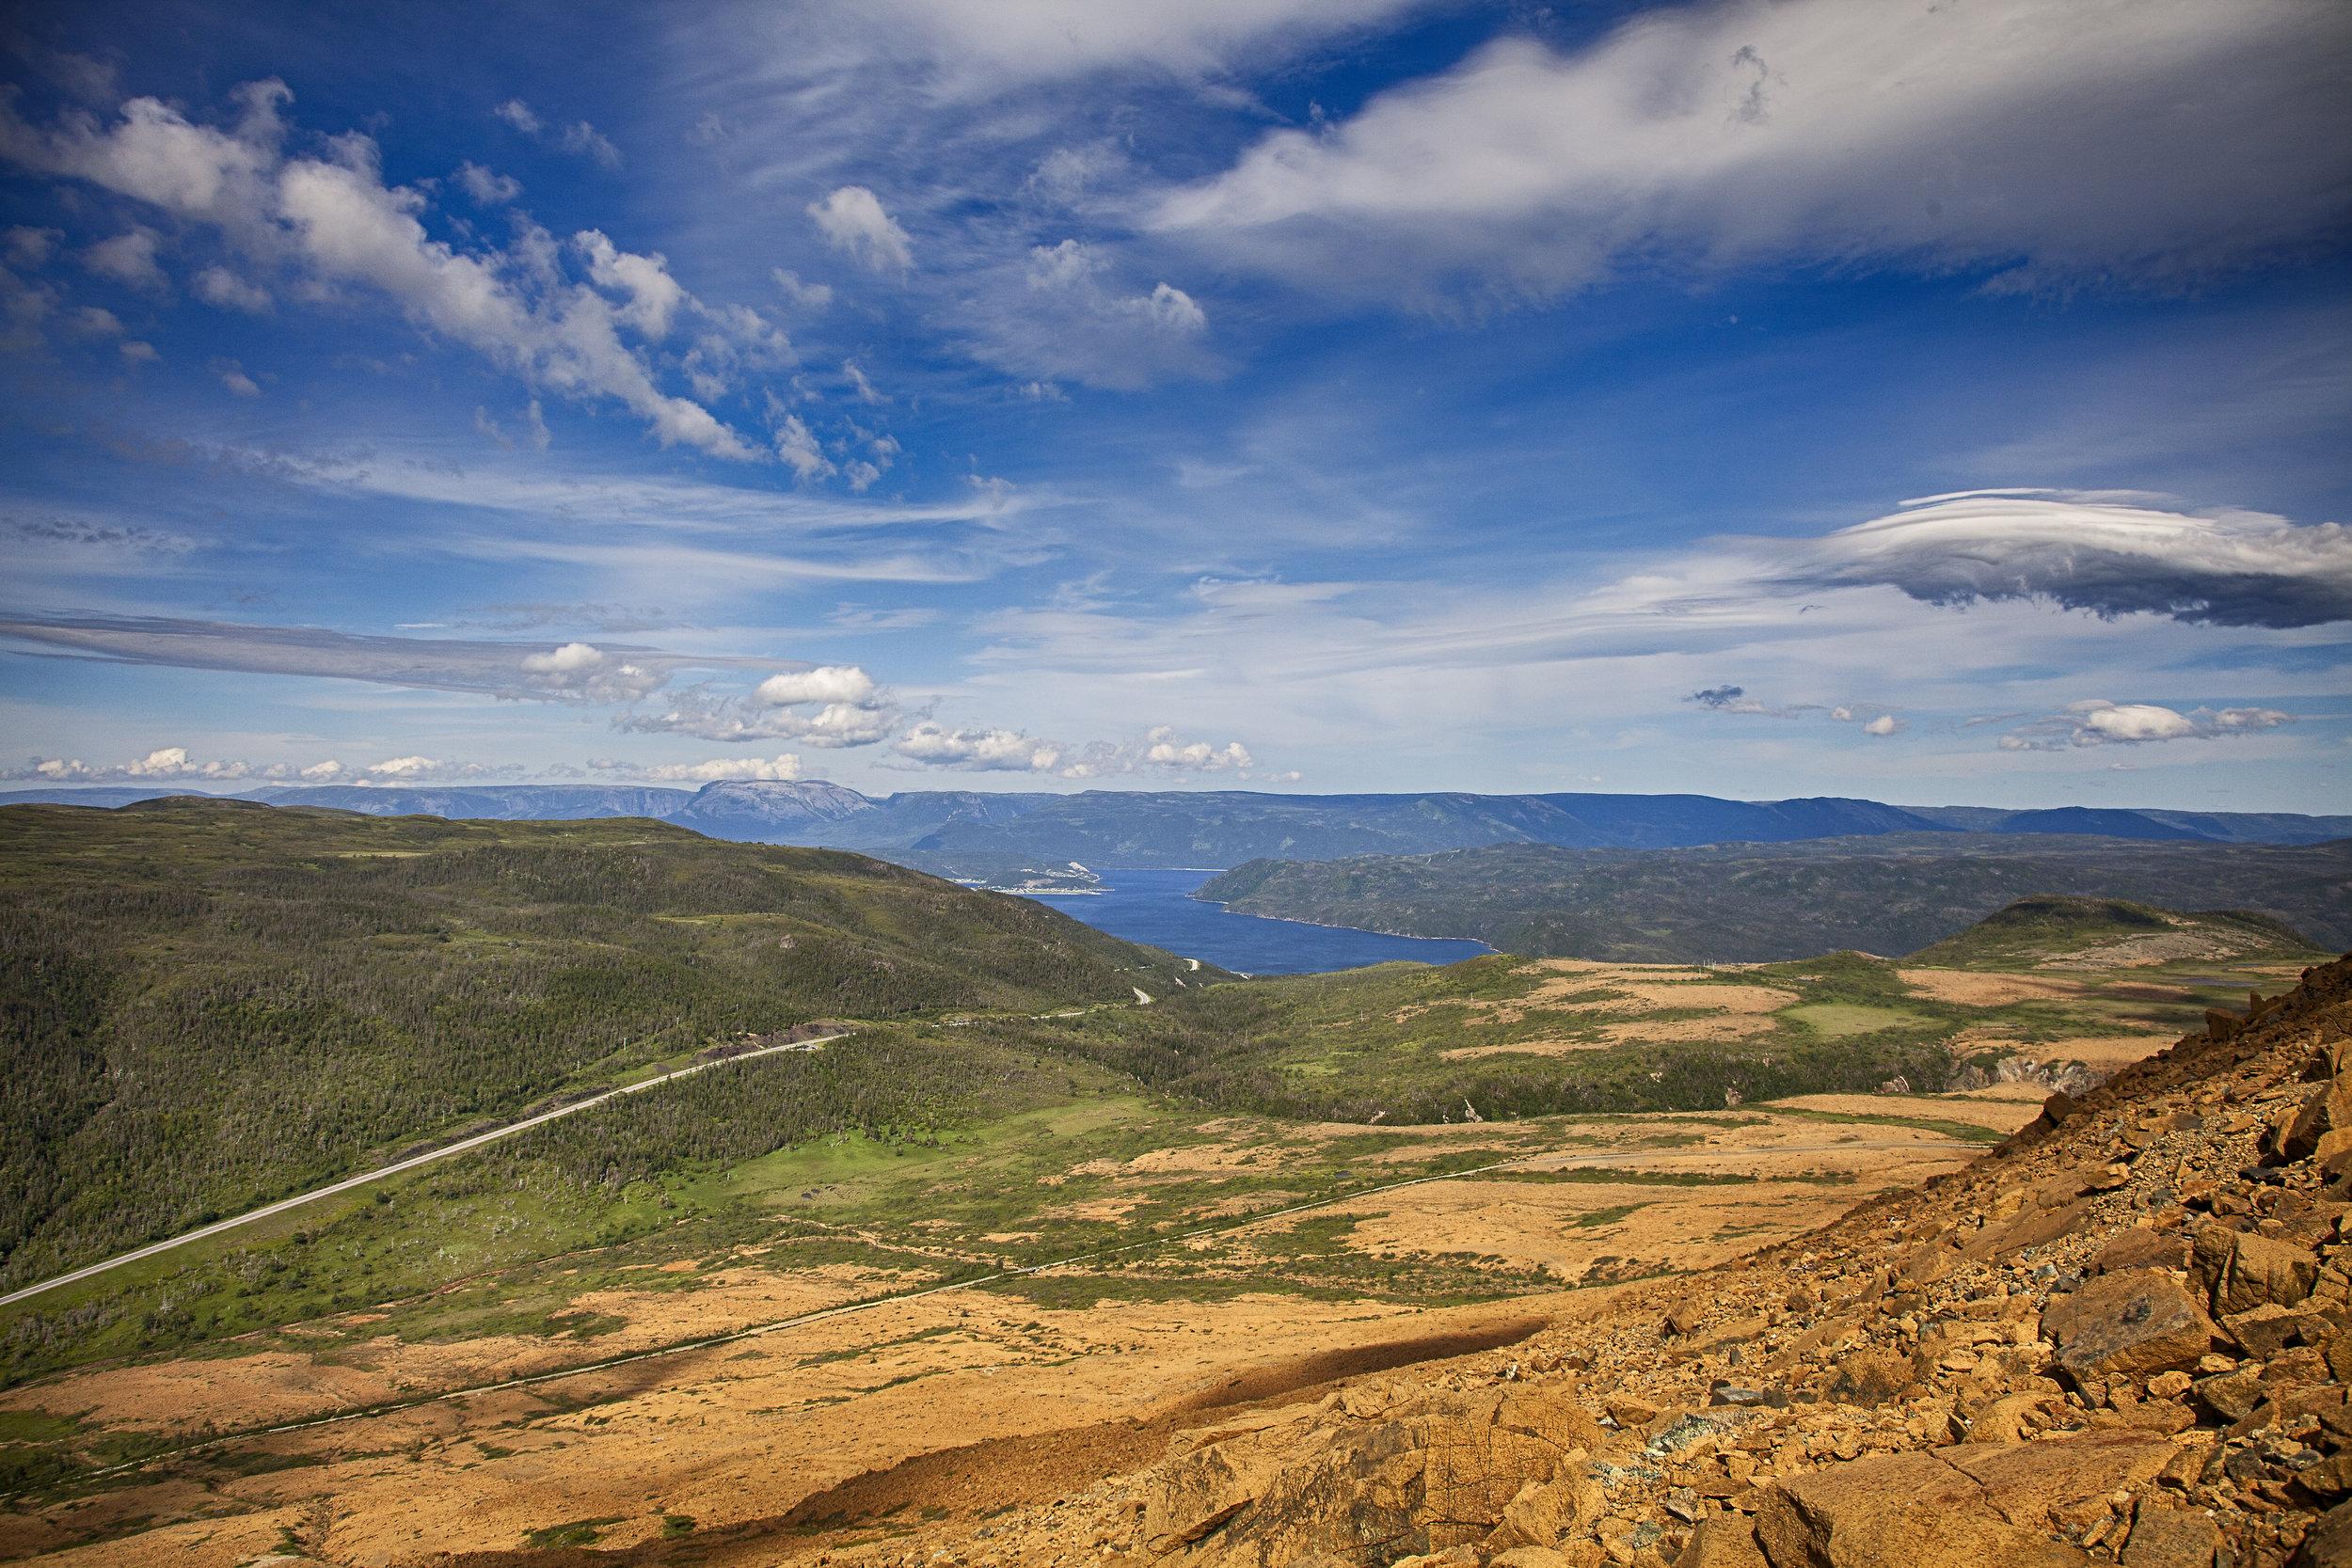 Gros Morne Views - Across the Blue Planet